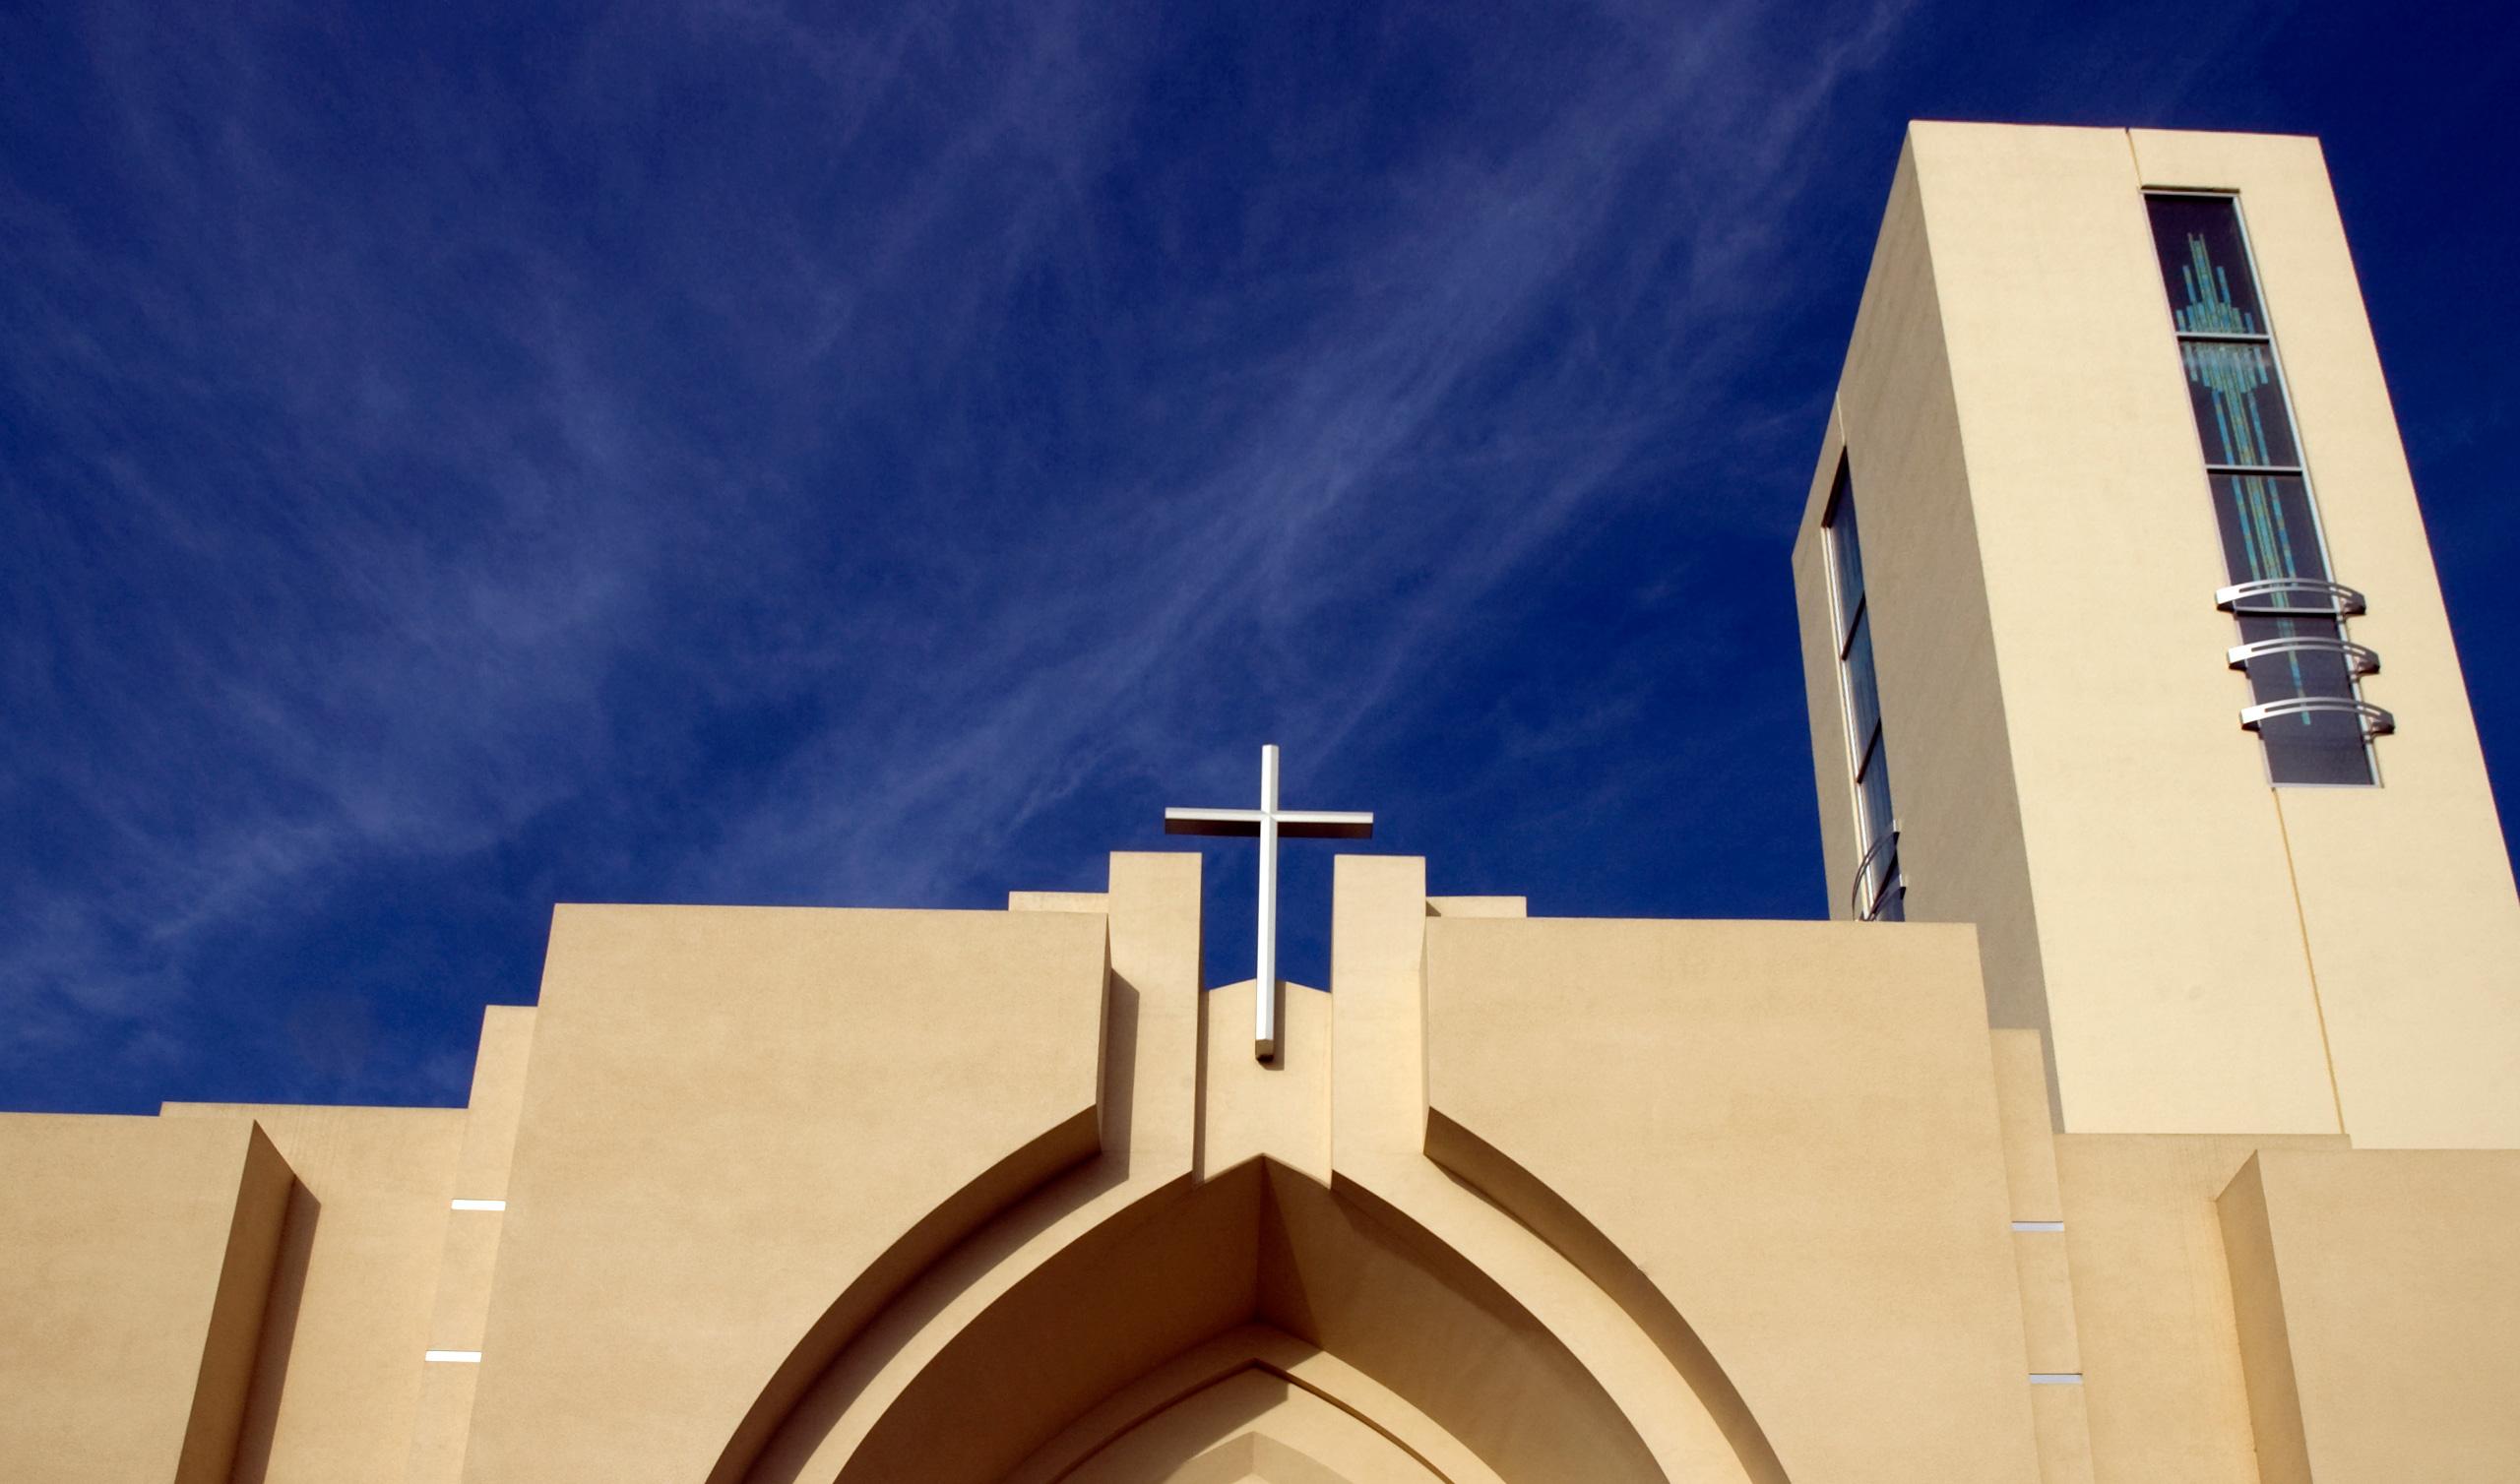 Loma Linda University Church of Seventh-day Adventists